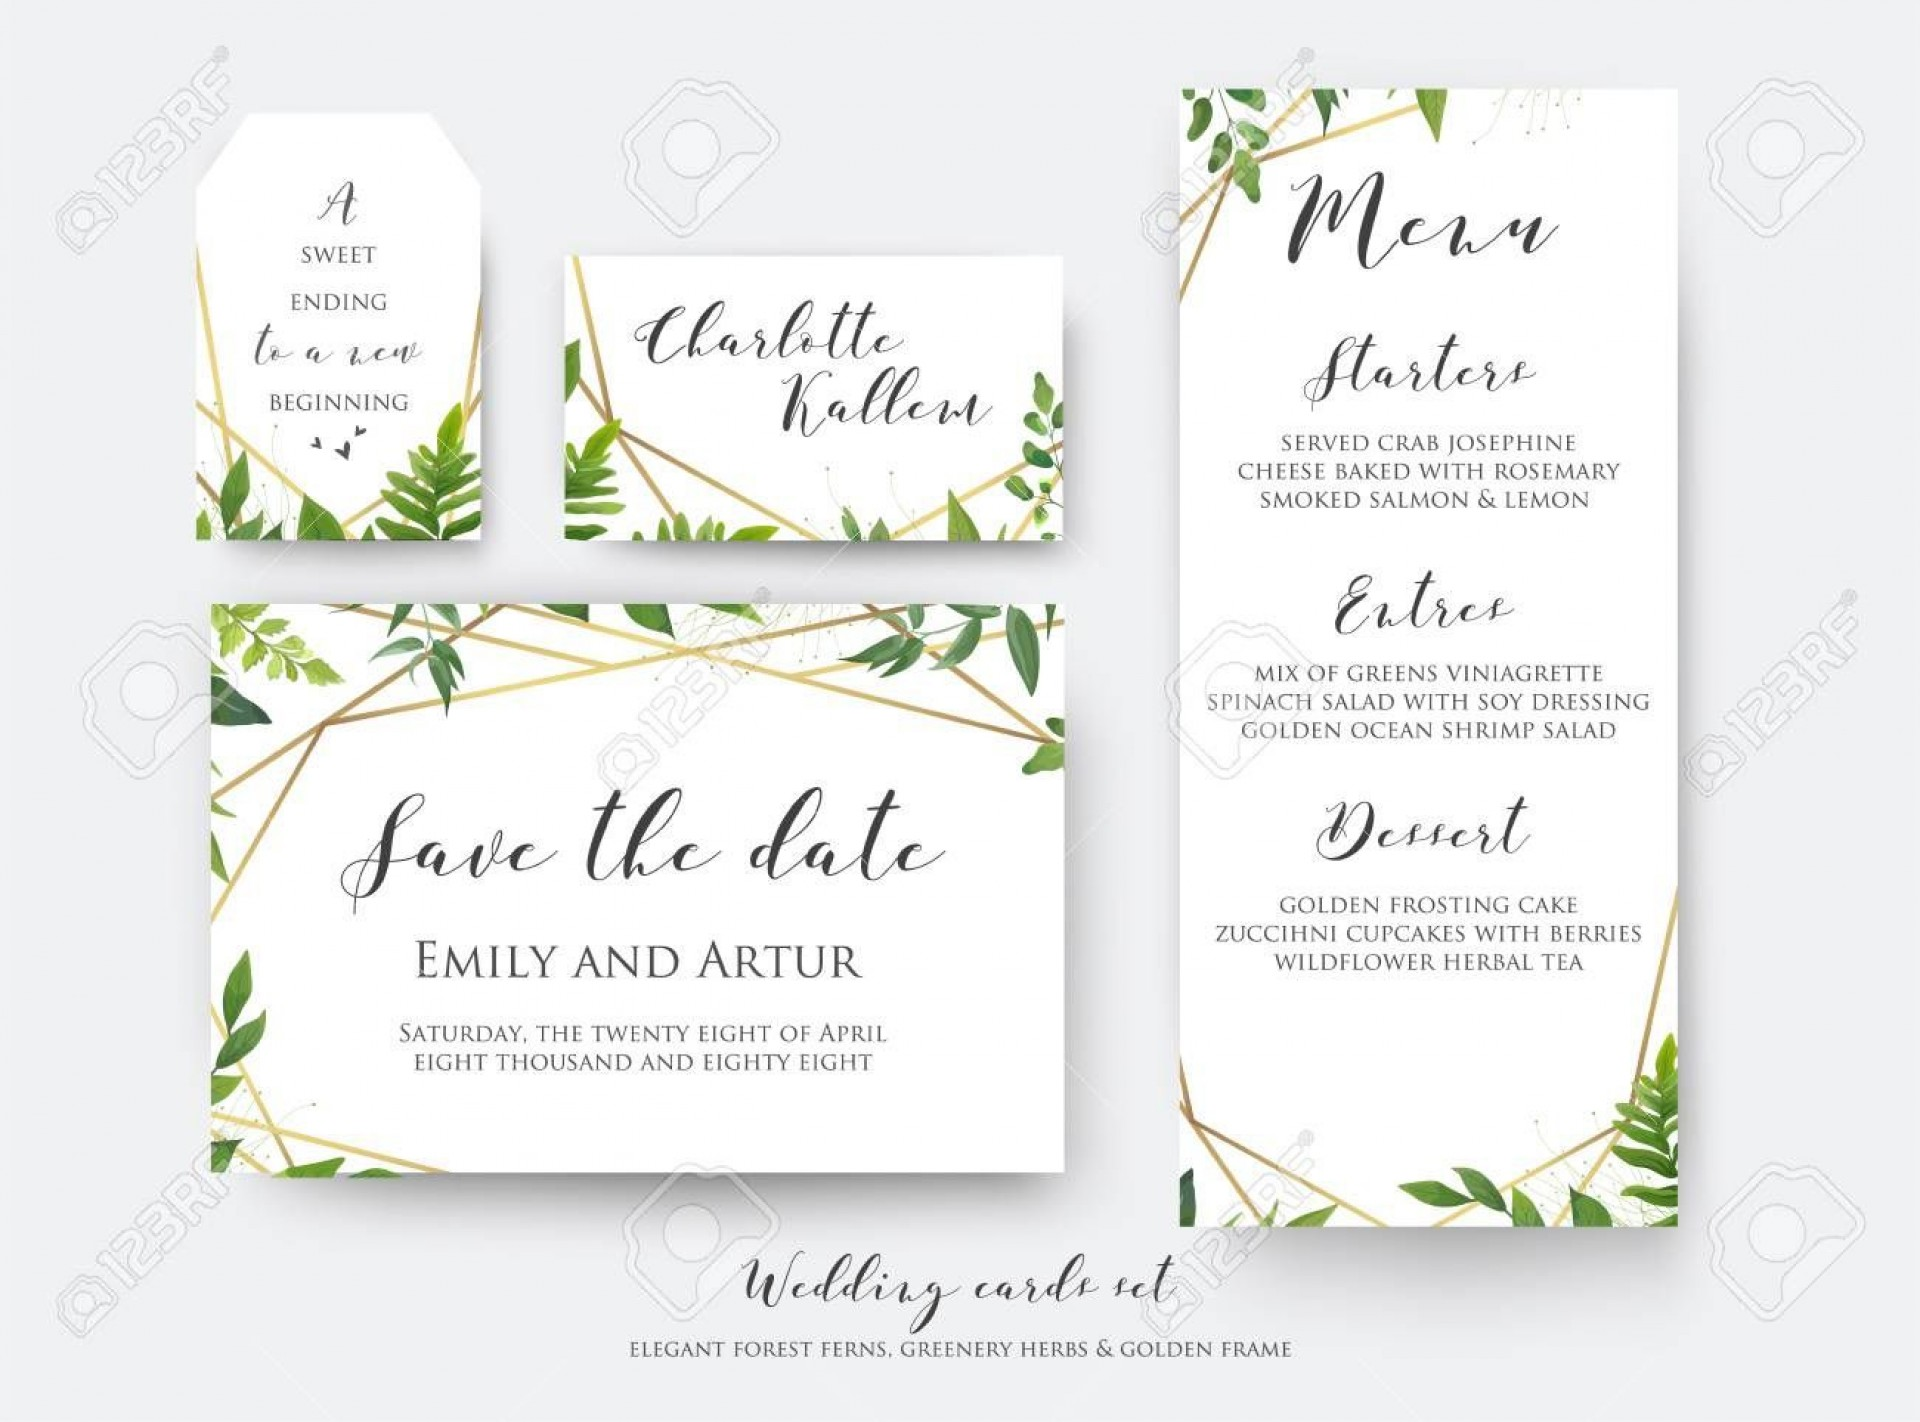 001 Unusual Wedding Addres Label Template Photo  Free Printable1920